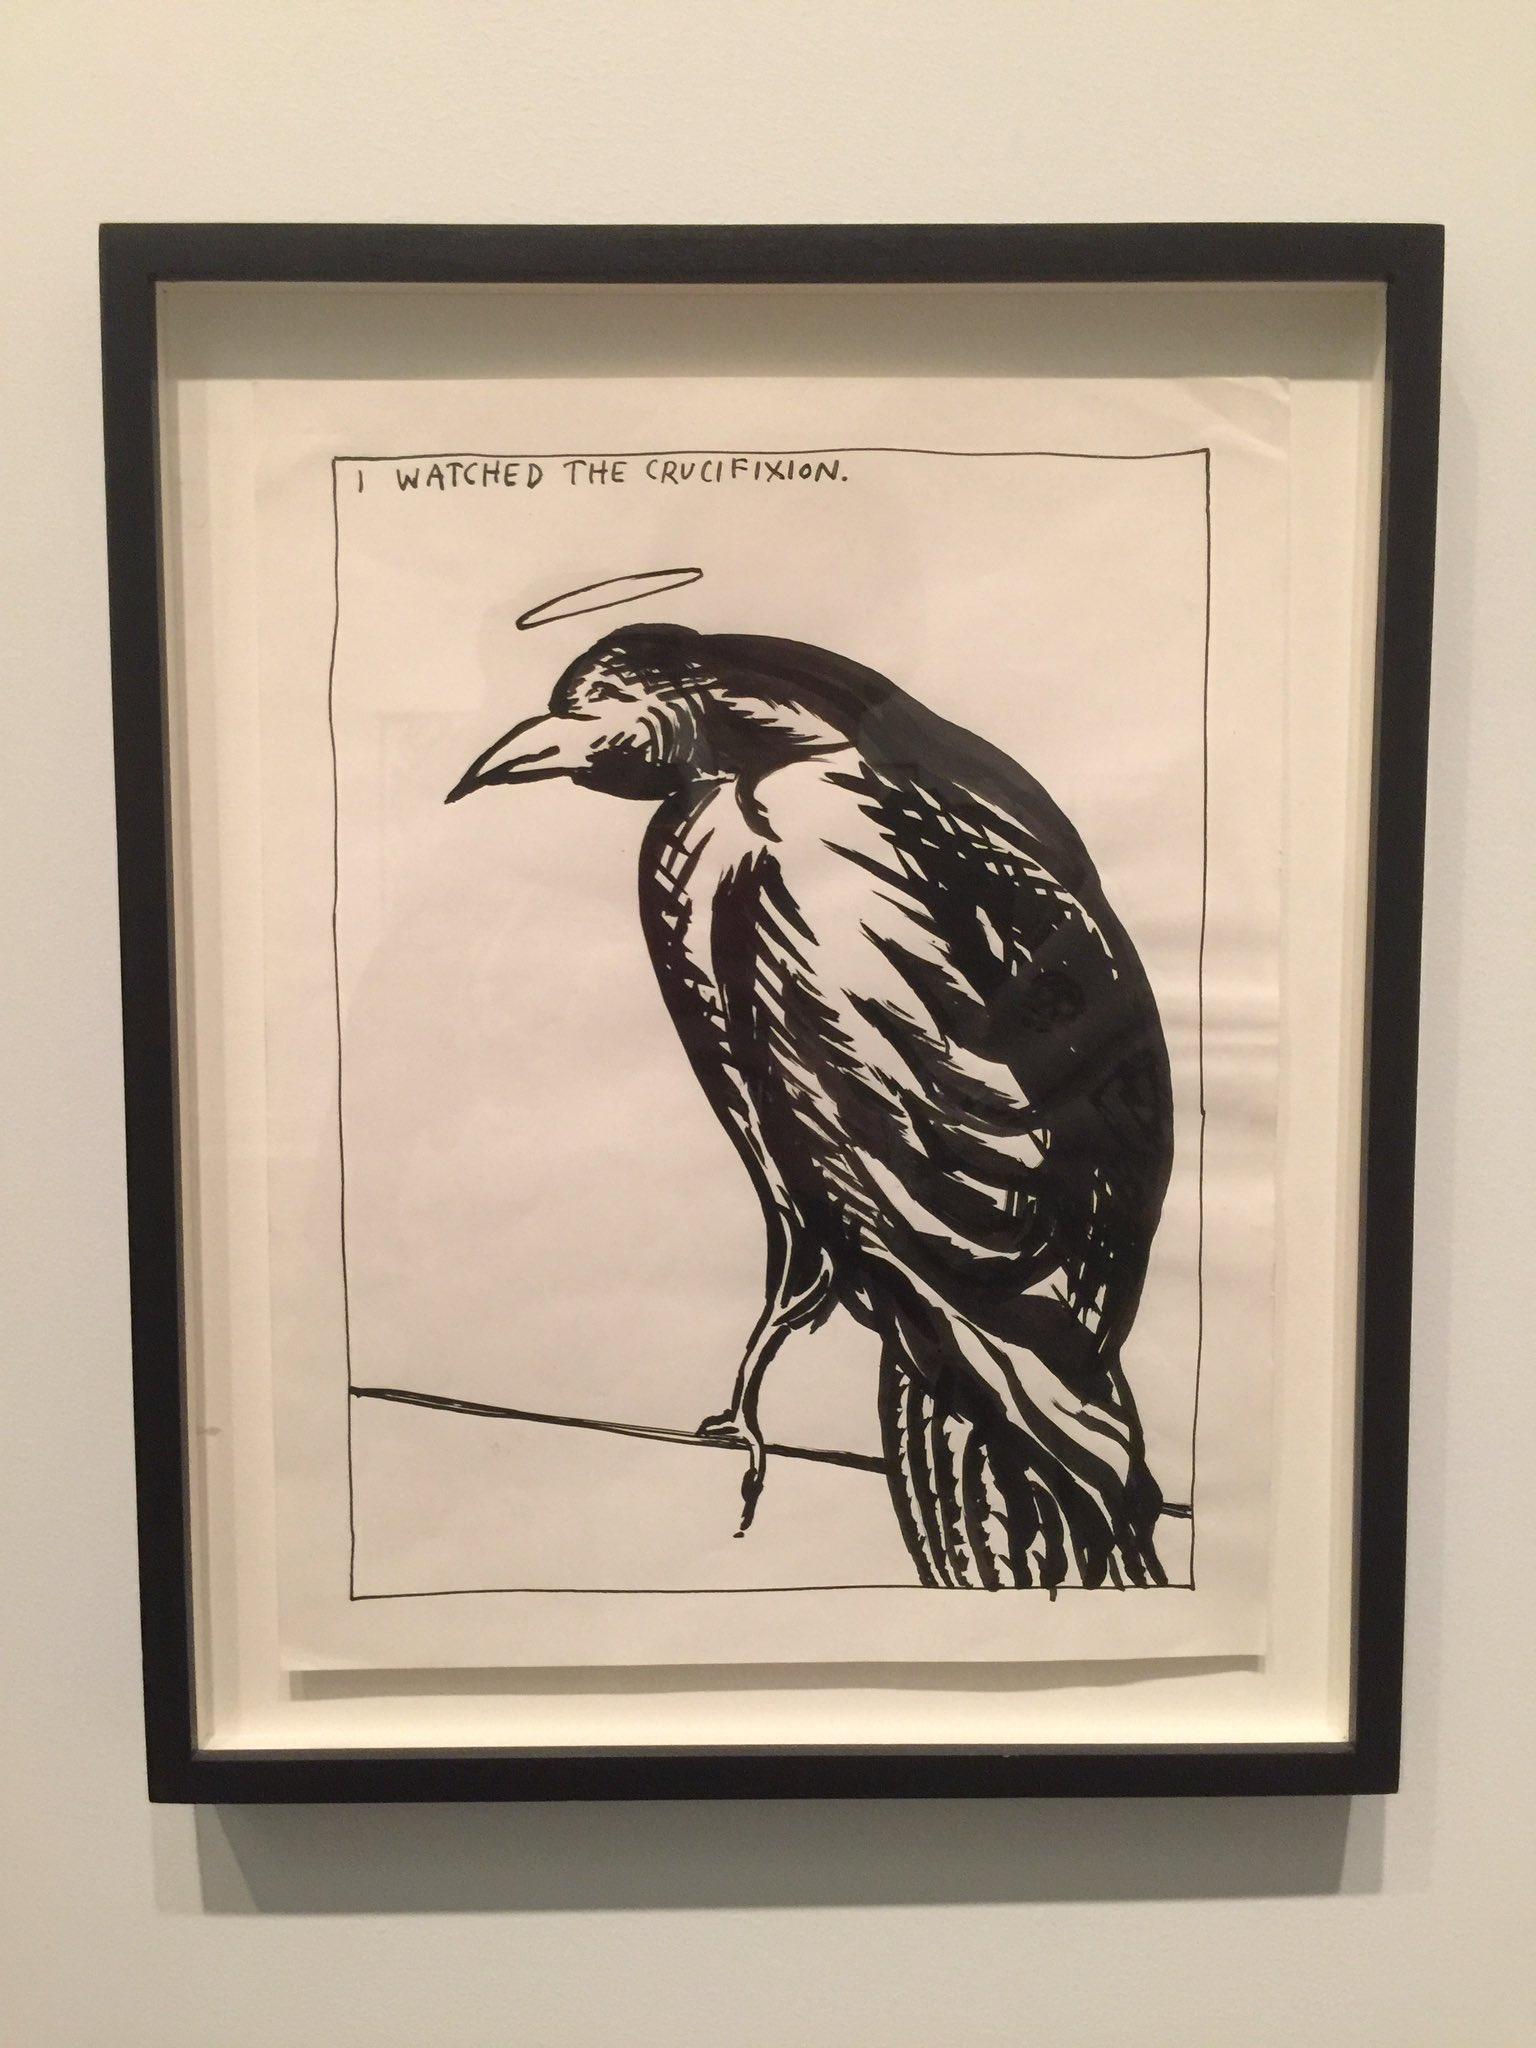 Raymond Pettibon. New Museum. NYC. If you can. You gotta go. https://t.co/NjISXNOITx